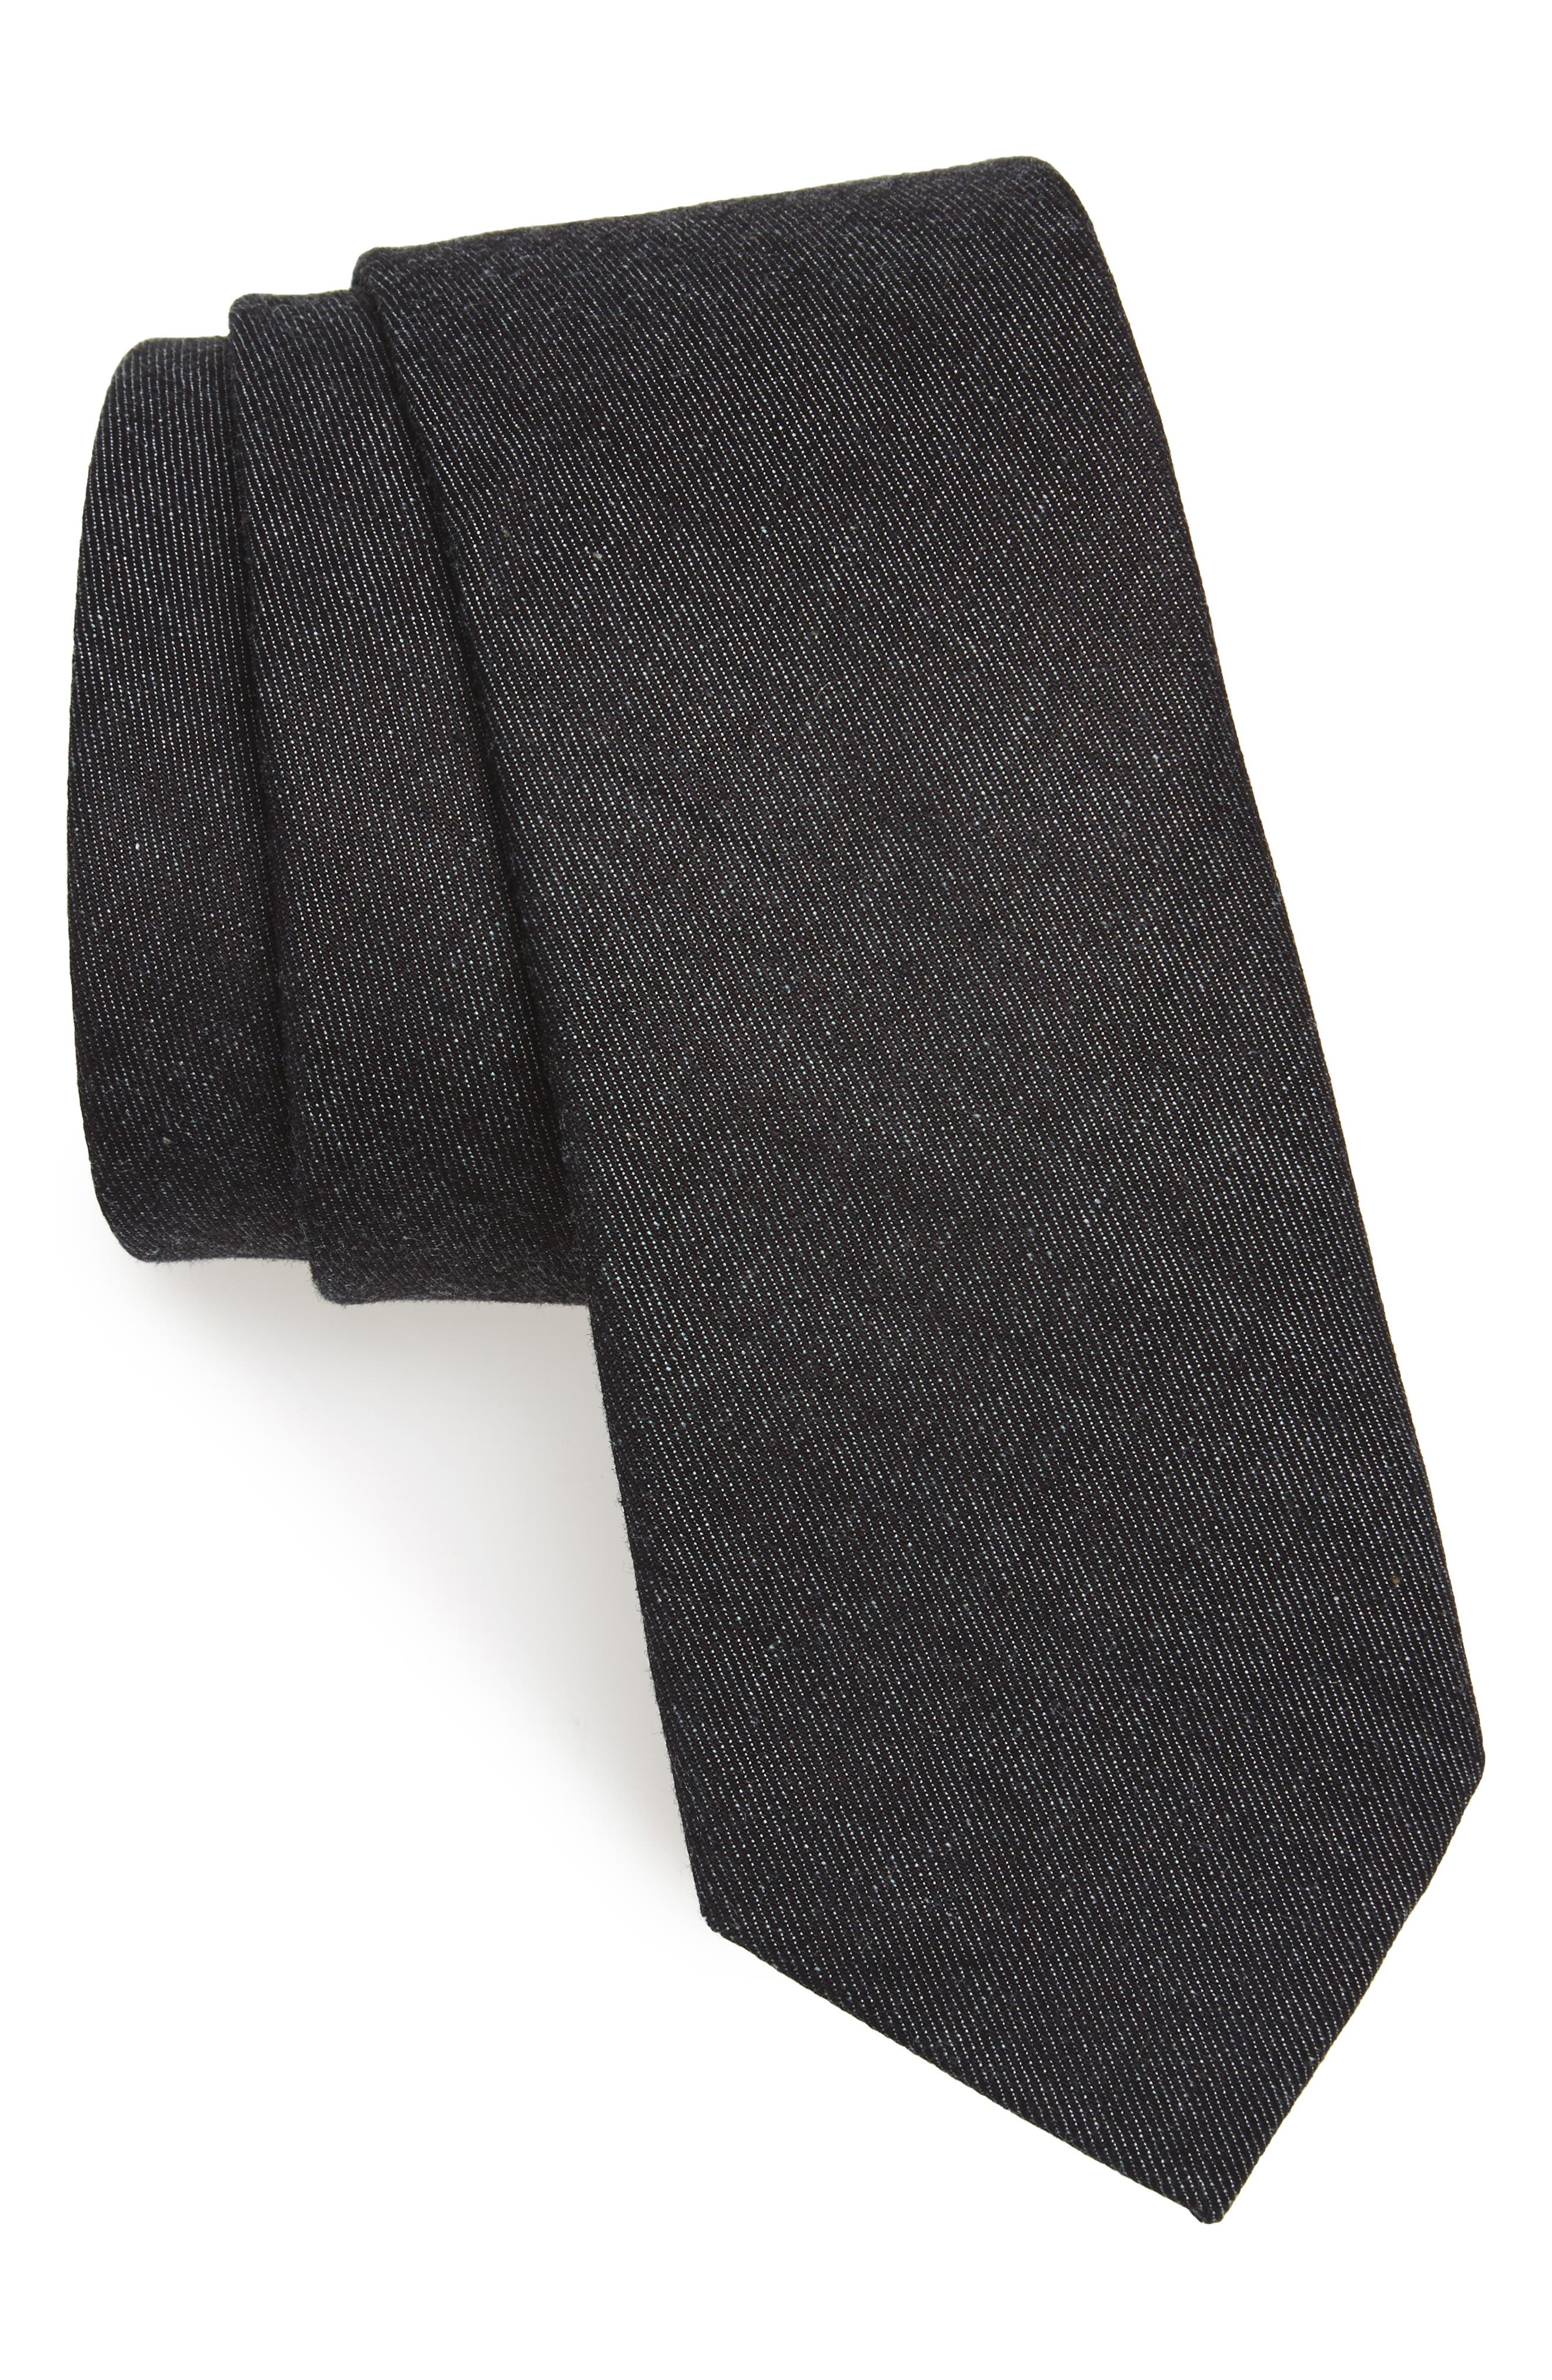 Bartlett Solid Cotton Tie,                         Main,                         color, 001